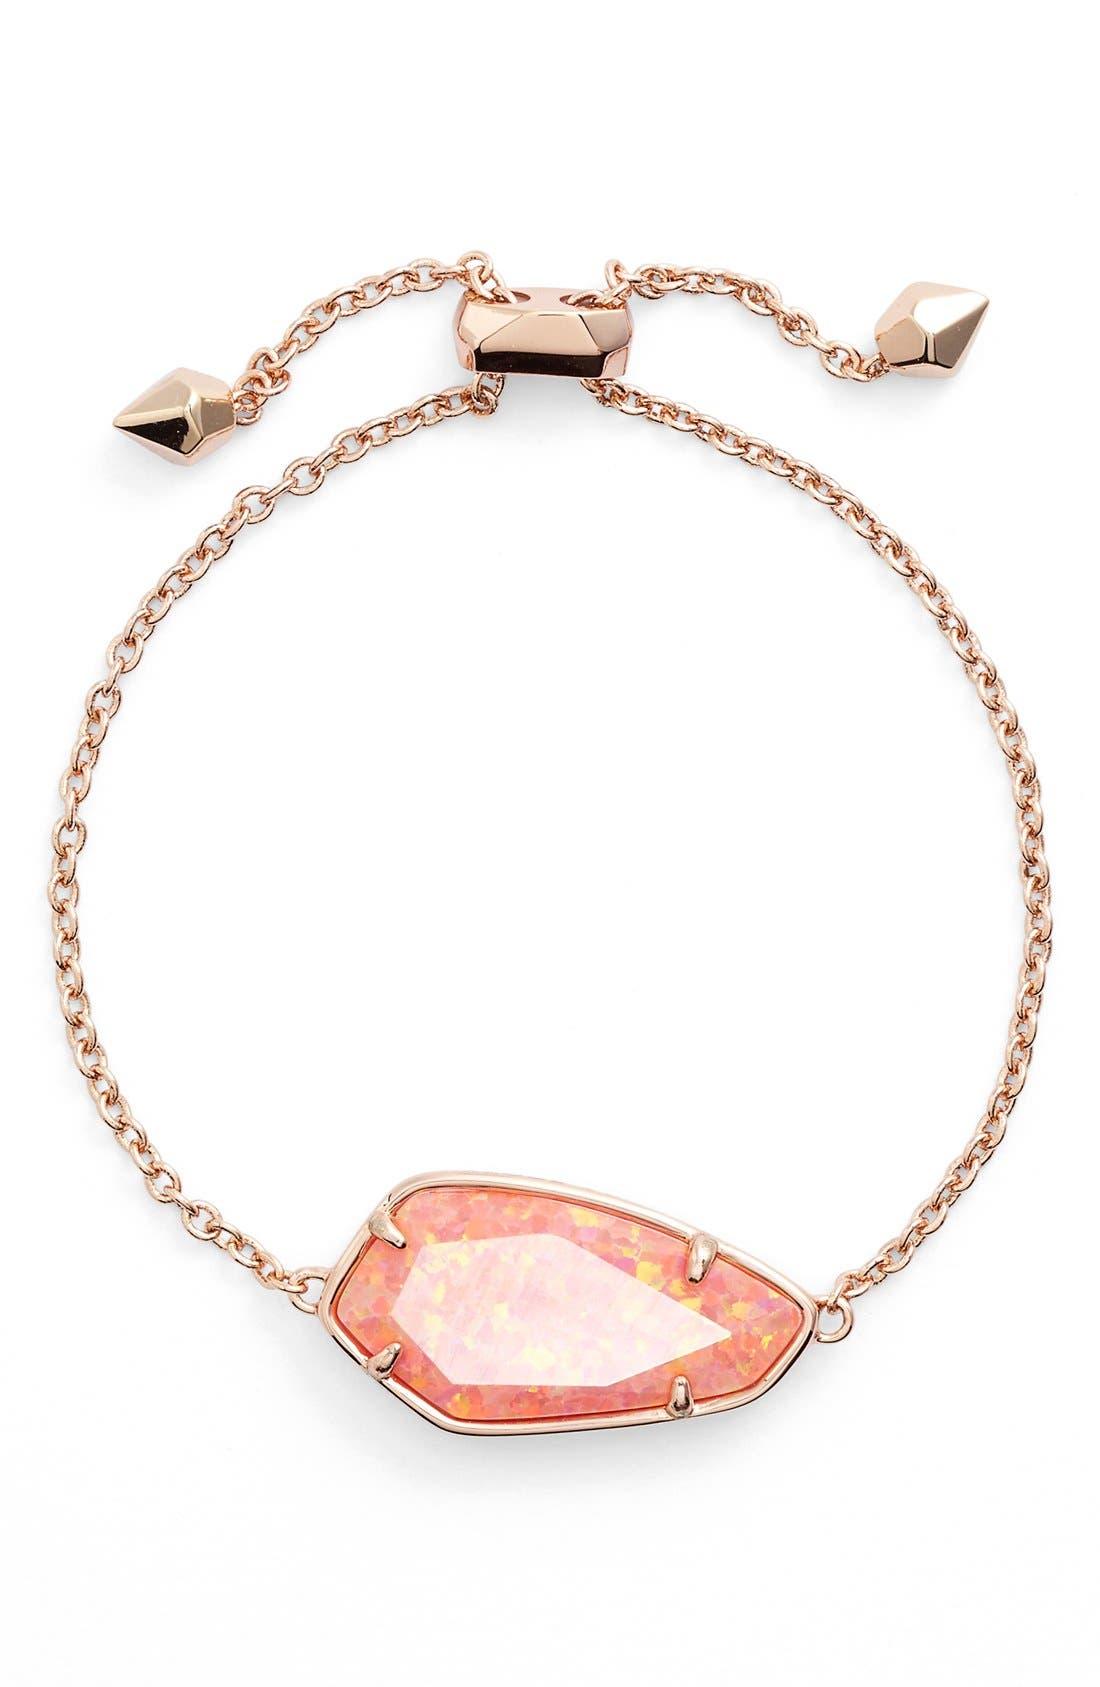 Main Image - Kendra Scott 'Cambel' Line Bracelet